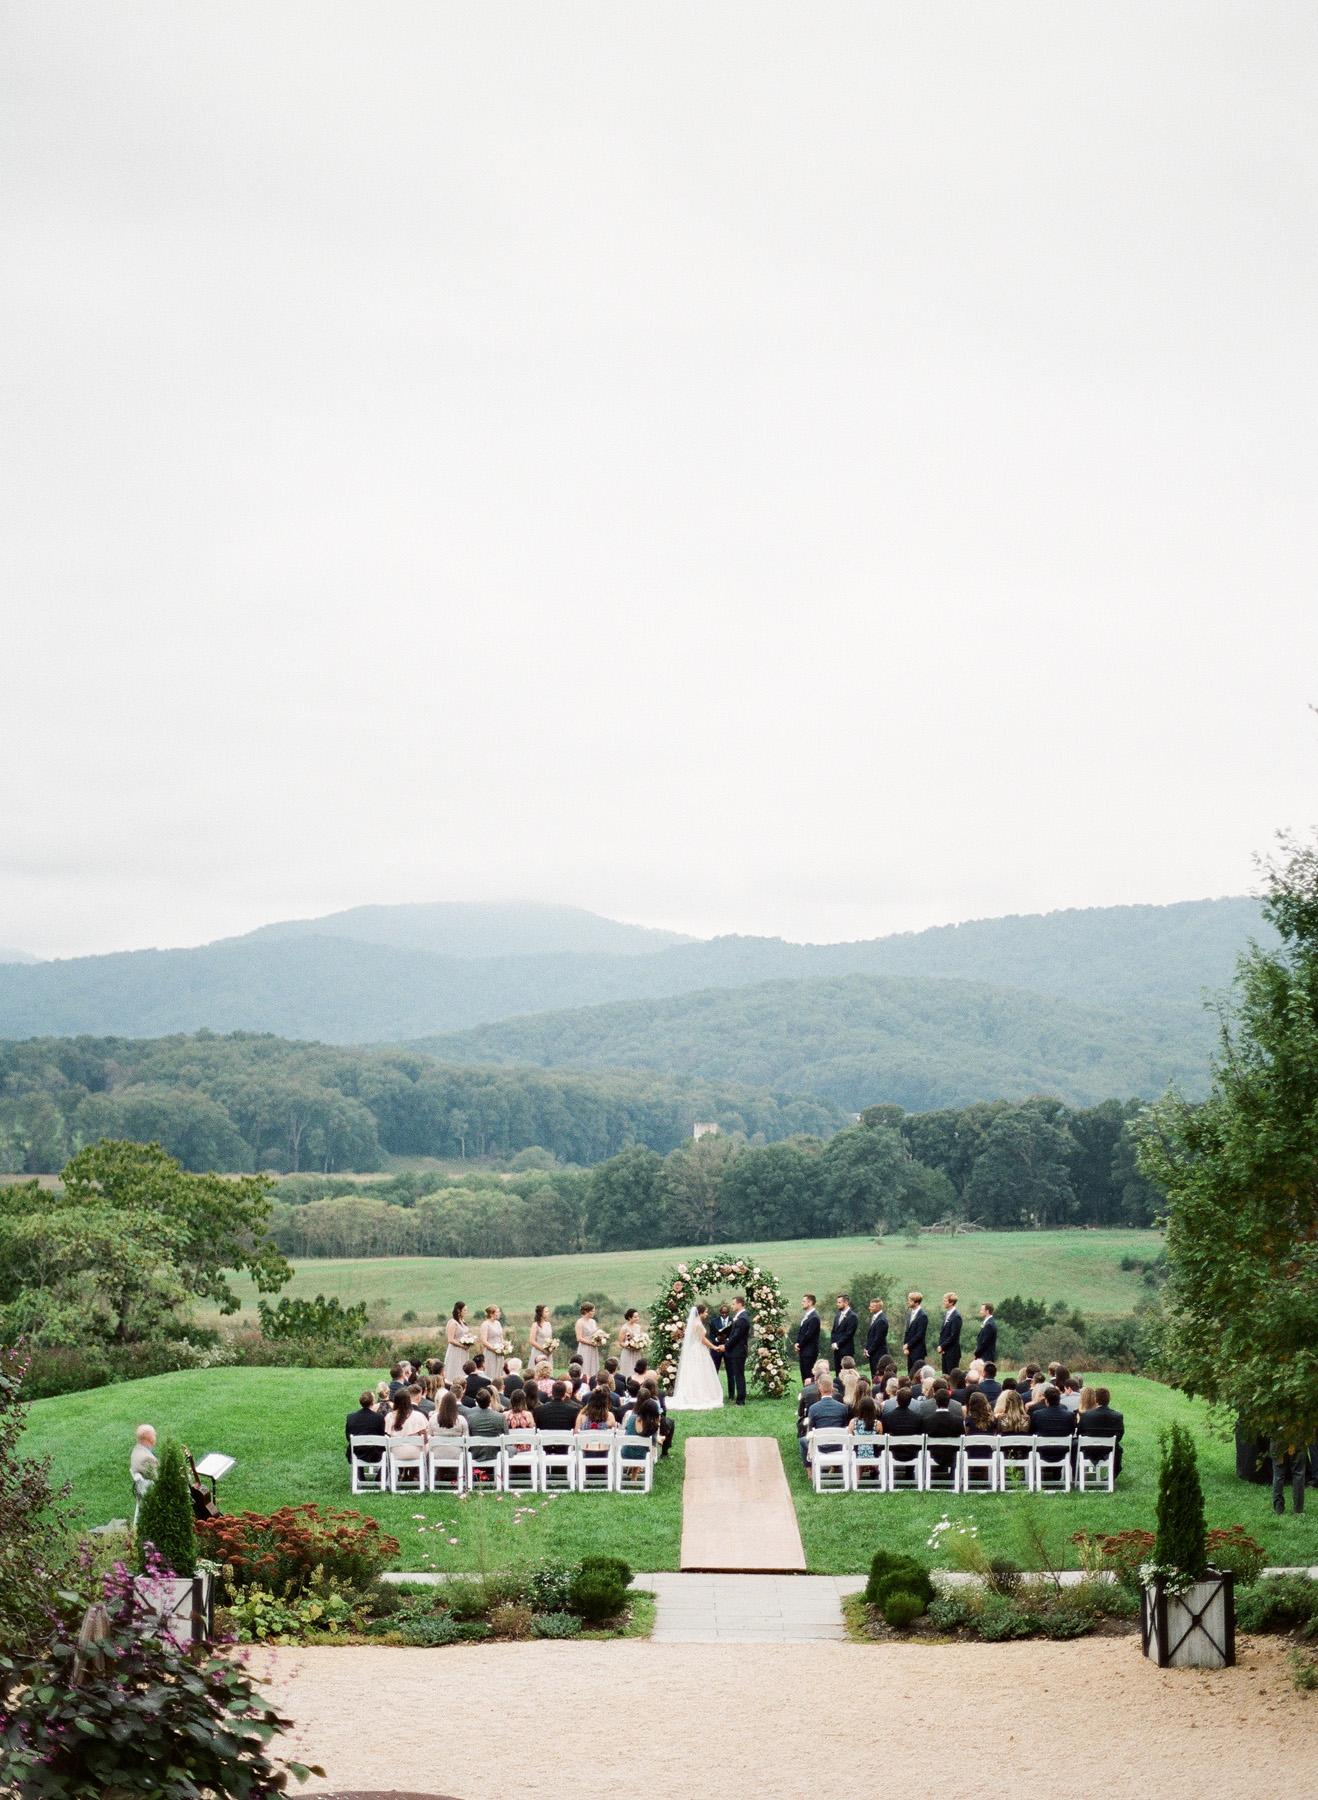 Pippin-Hill-Farm-and-Vinyards-Wedding-Film-Photography-28.jpg